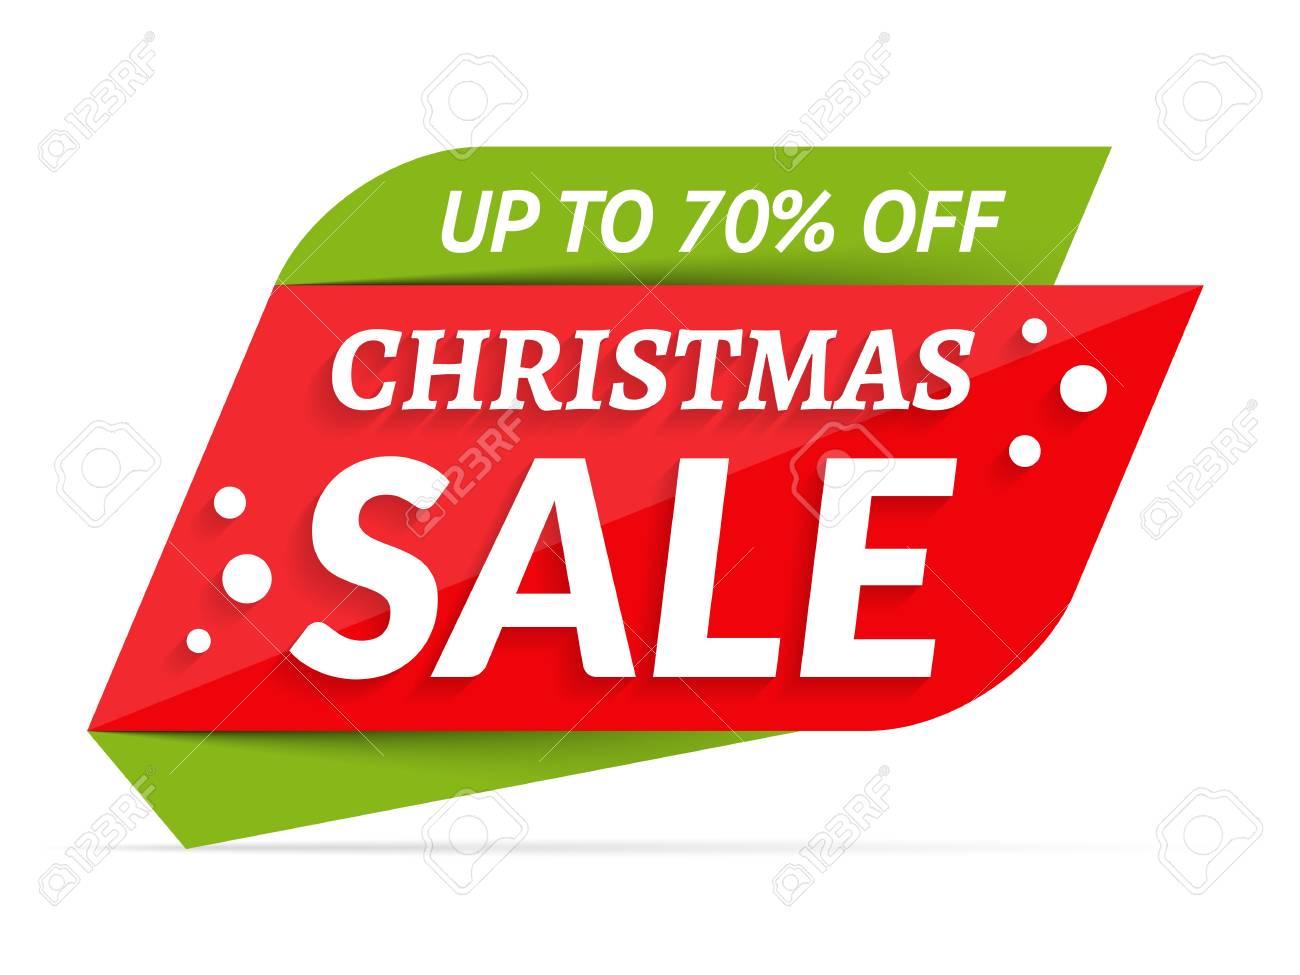 Christmas Sale banner, 70% off vector illustration. - 88539863